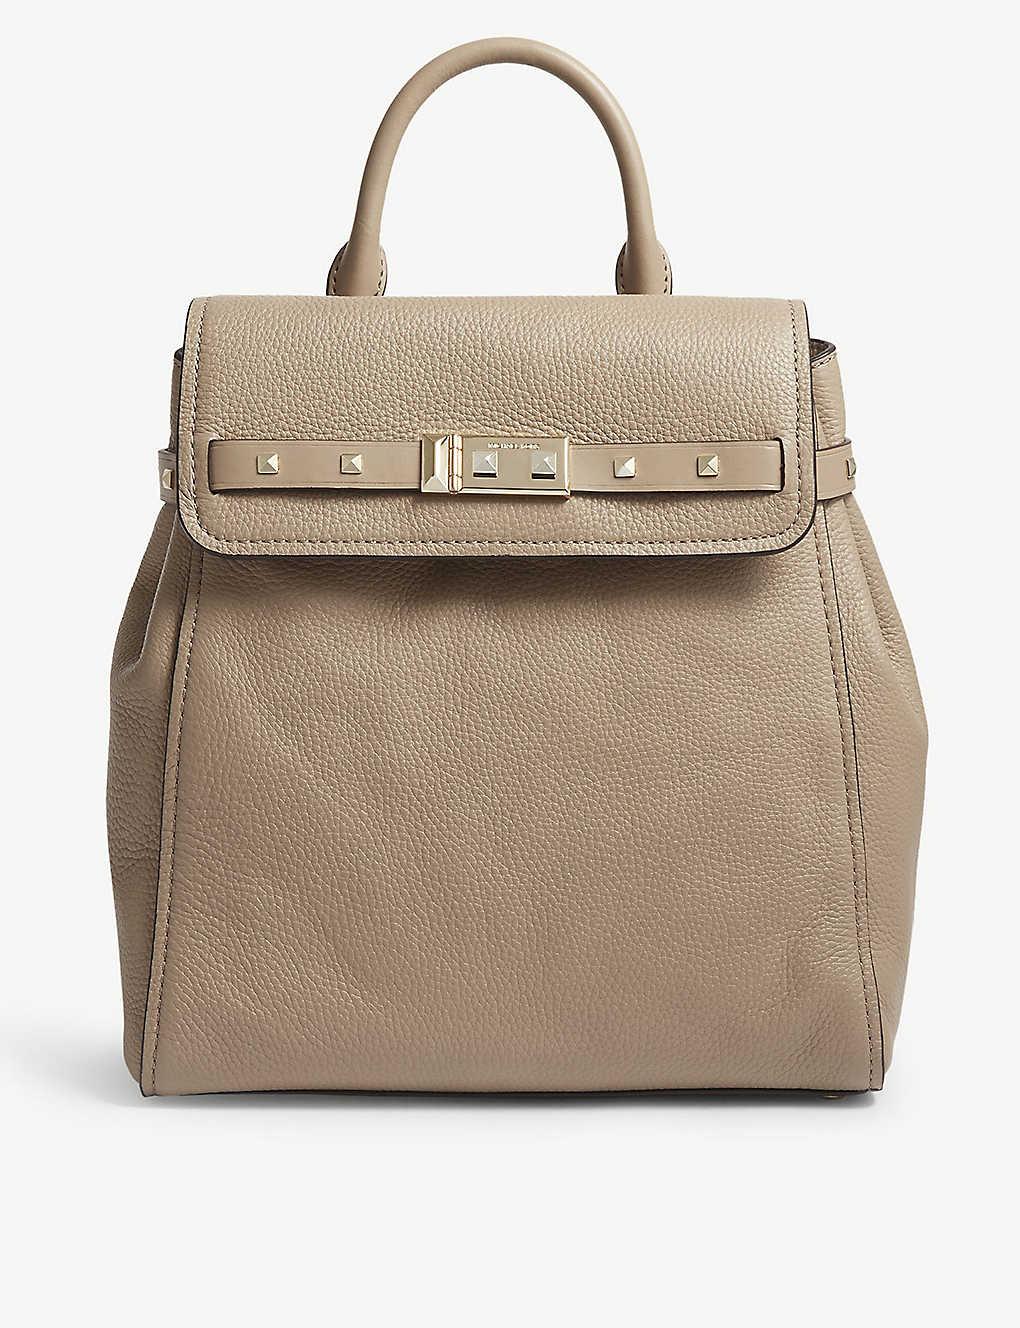 70e2b8a257e4 MICHAEL MICHAEL KORS - Addison medium leather backpack | Selfridges.com